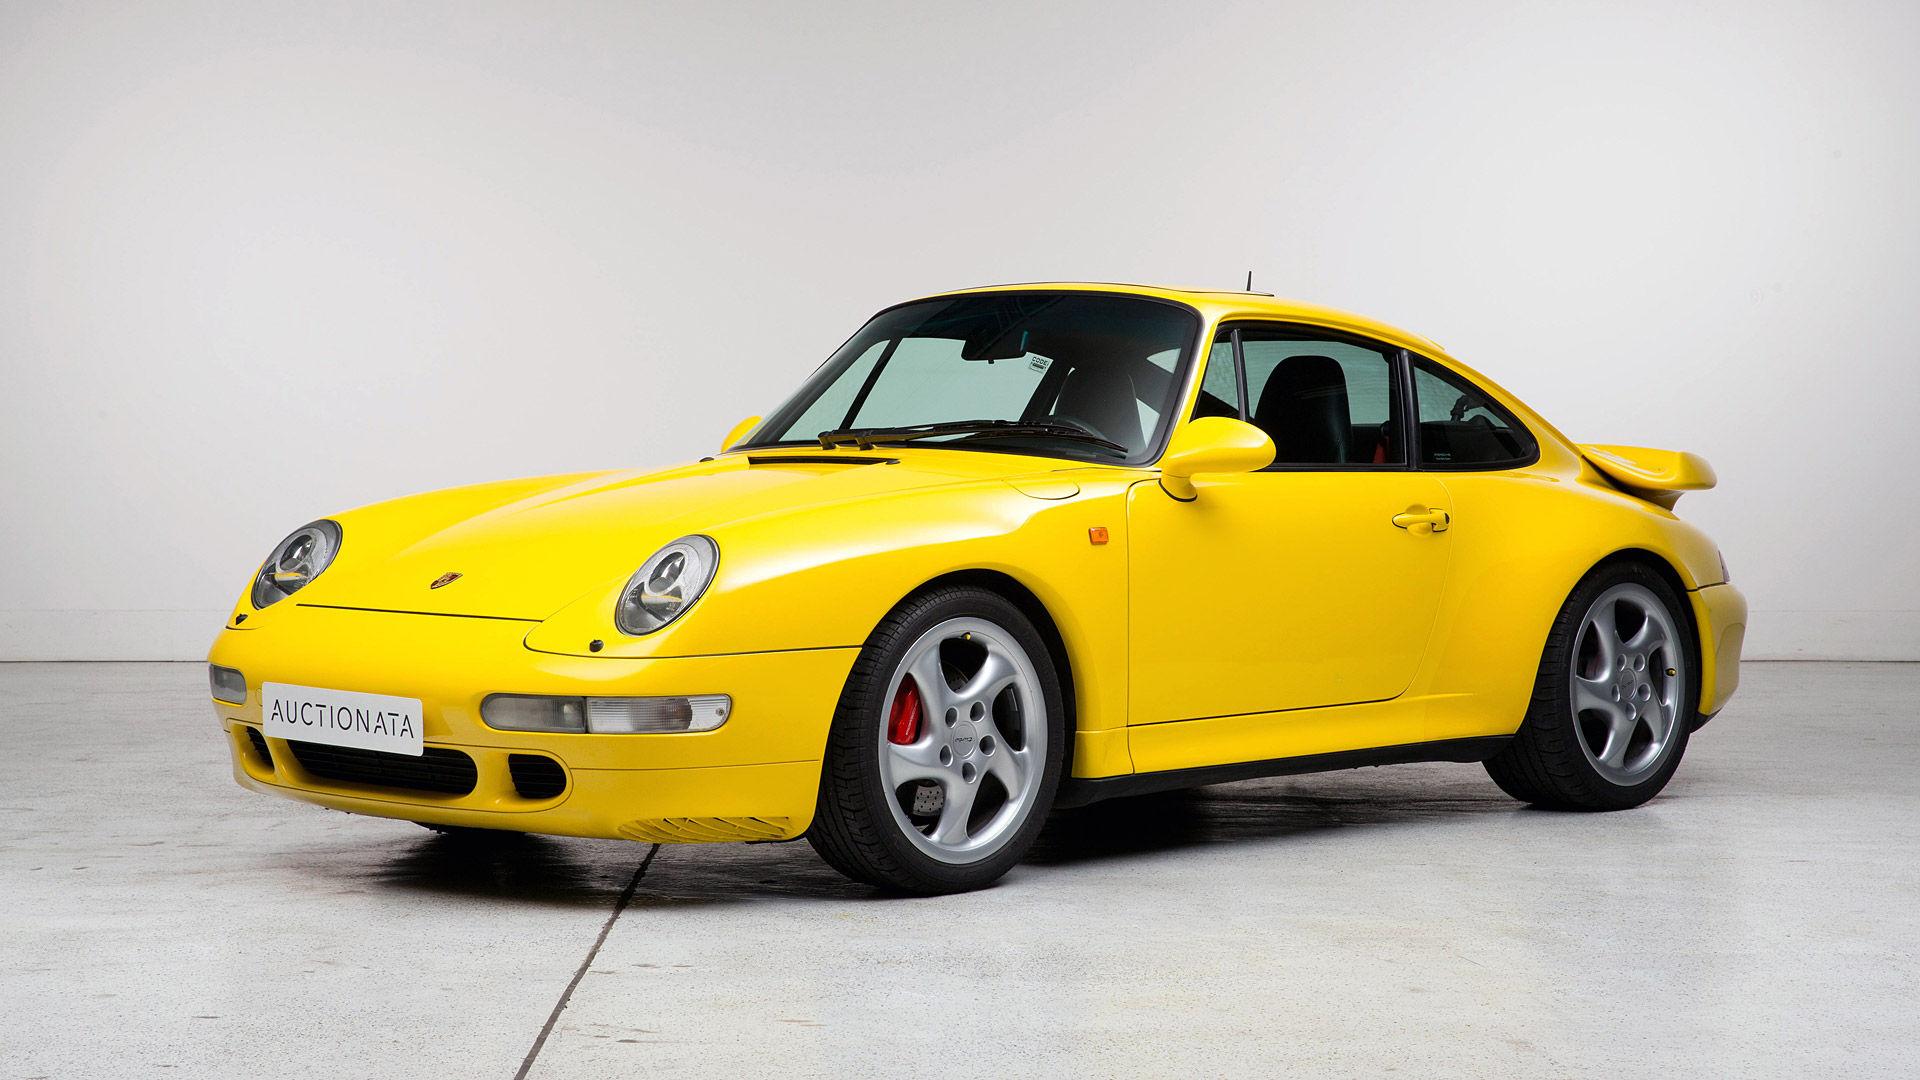 1995 Porsche 911 Turbo 3.6 Coupe